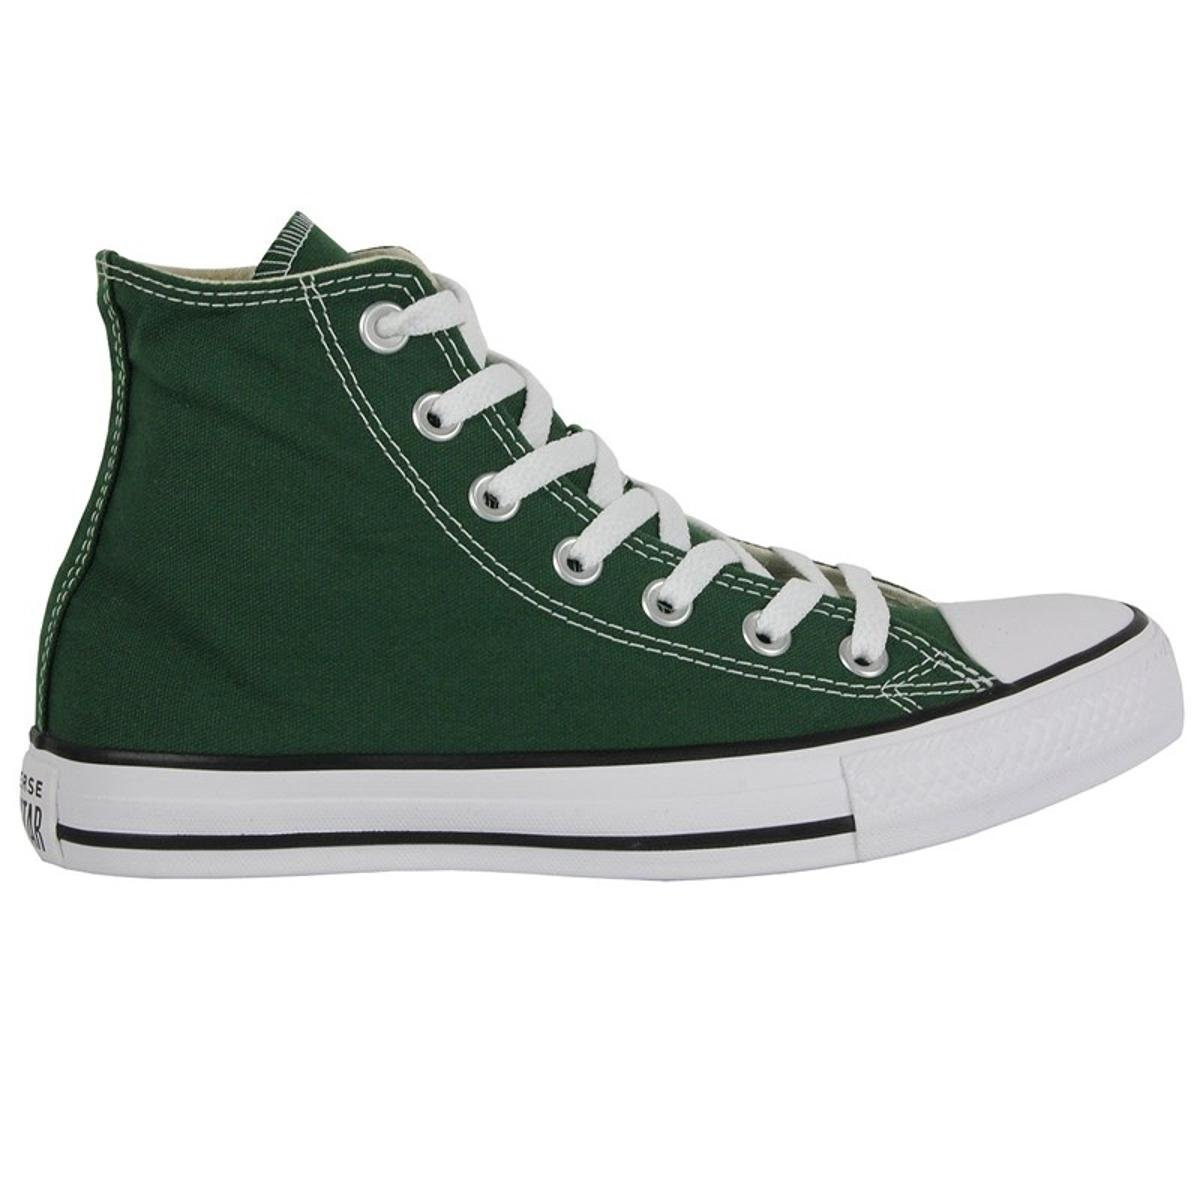 e76bad4c37652 Tênis Converse Chuck Taylor All Star Masculino - Verde